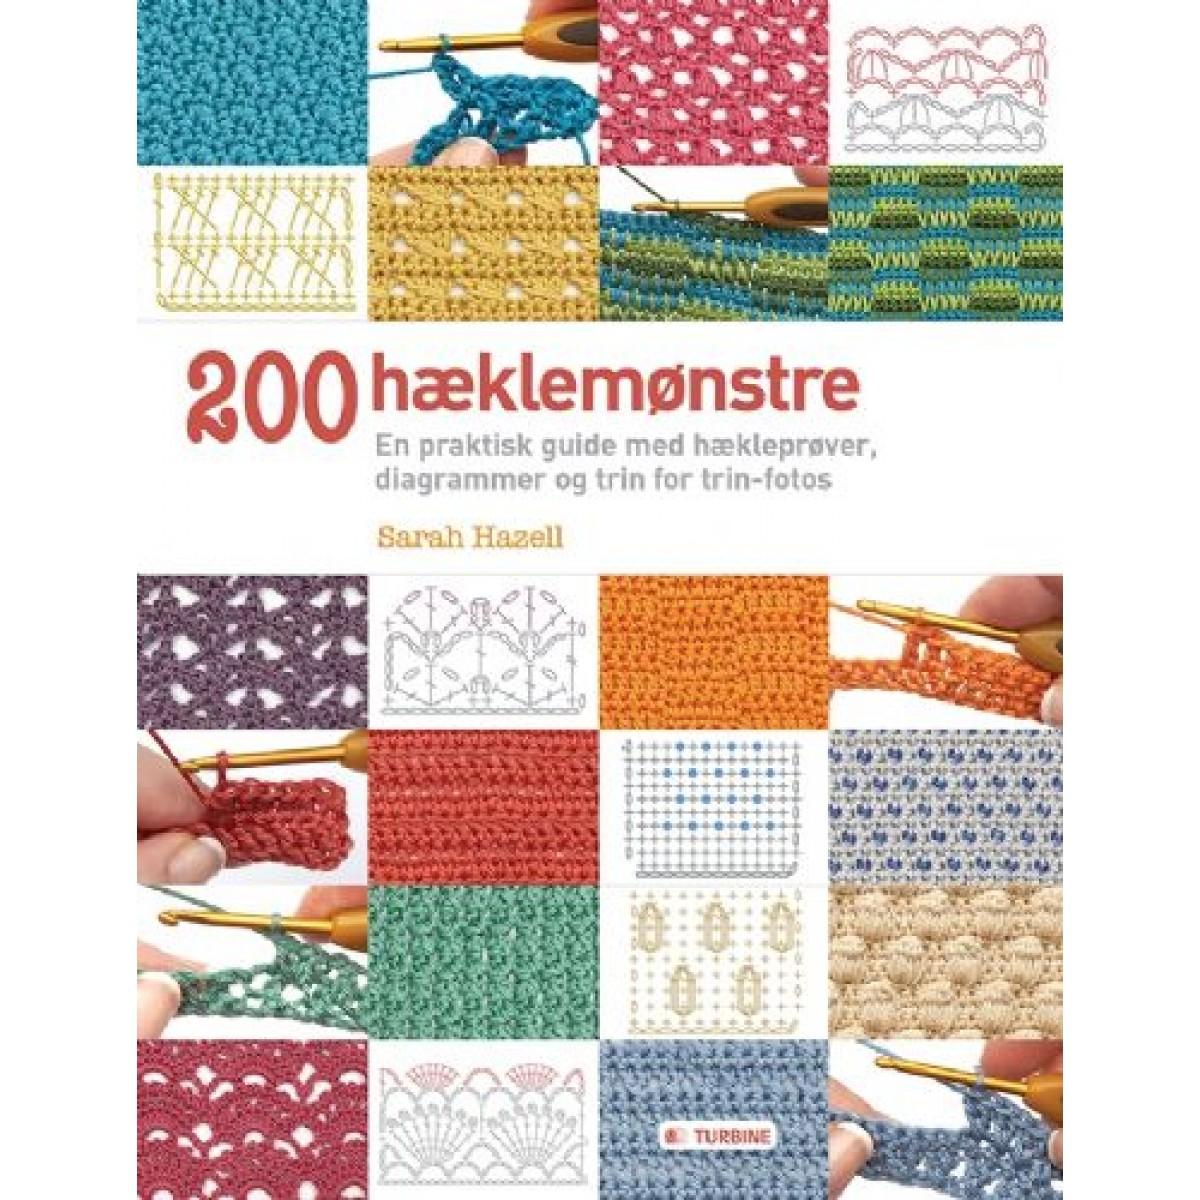 200 hæklemønstre-31